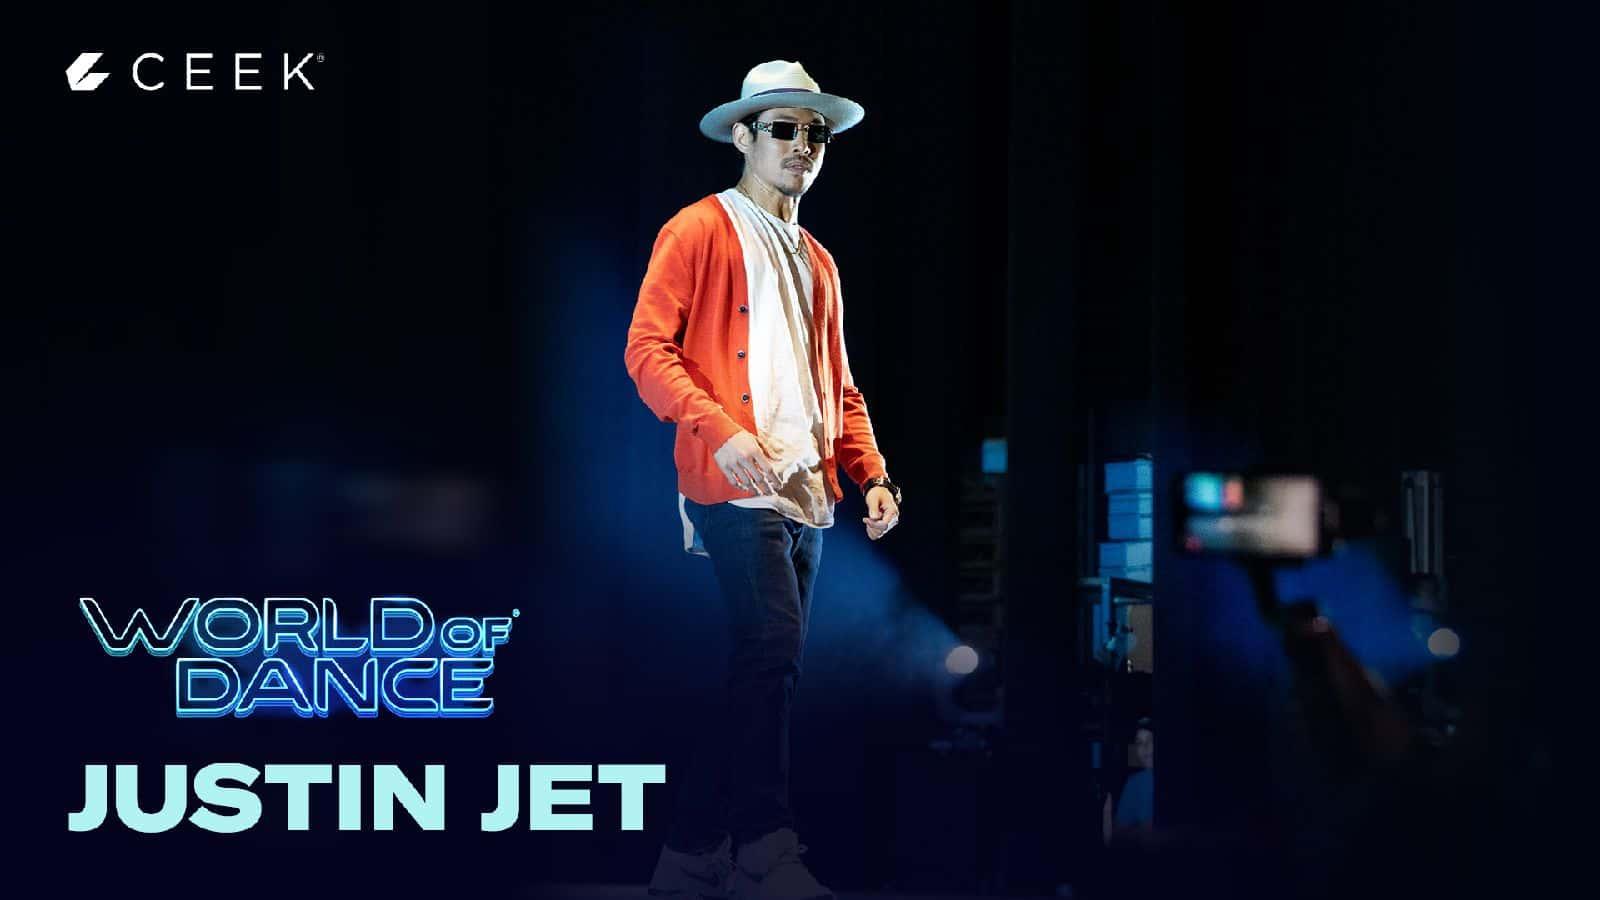 Justin Jet